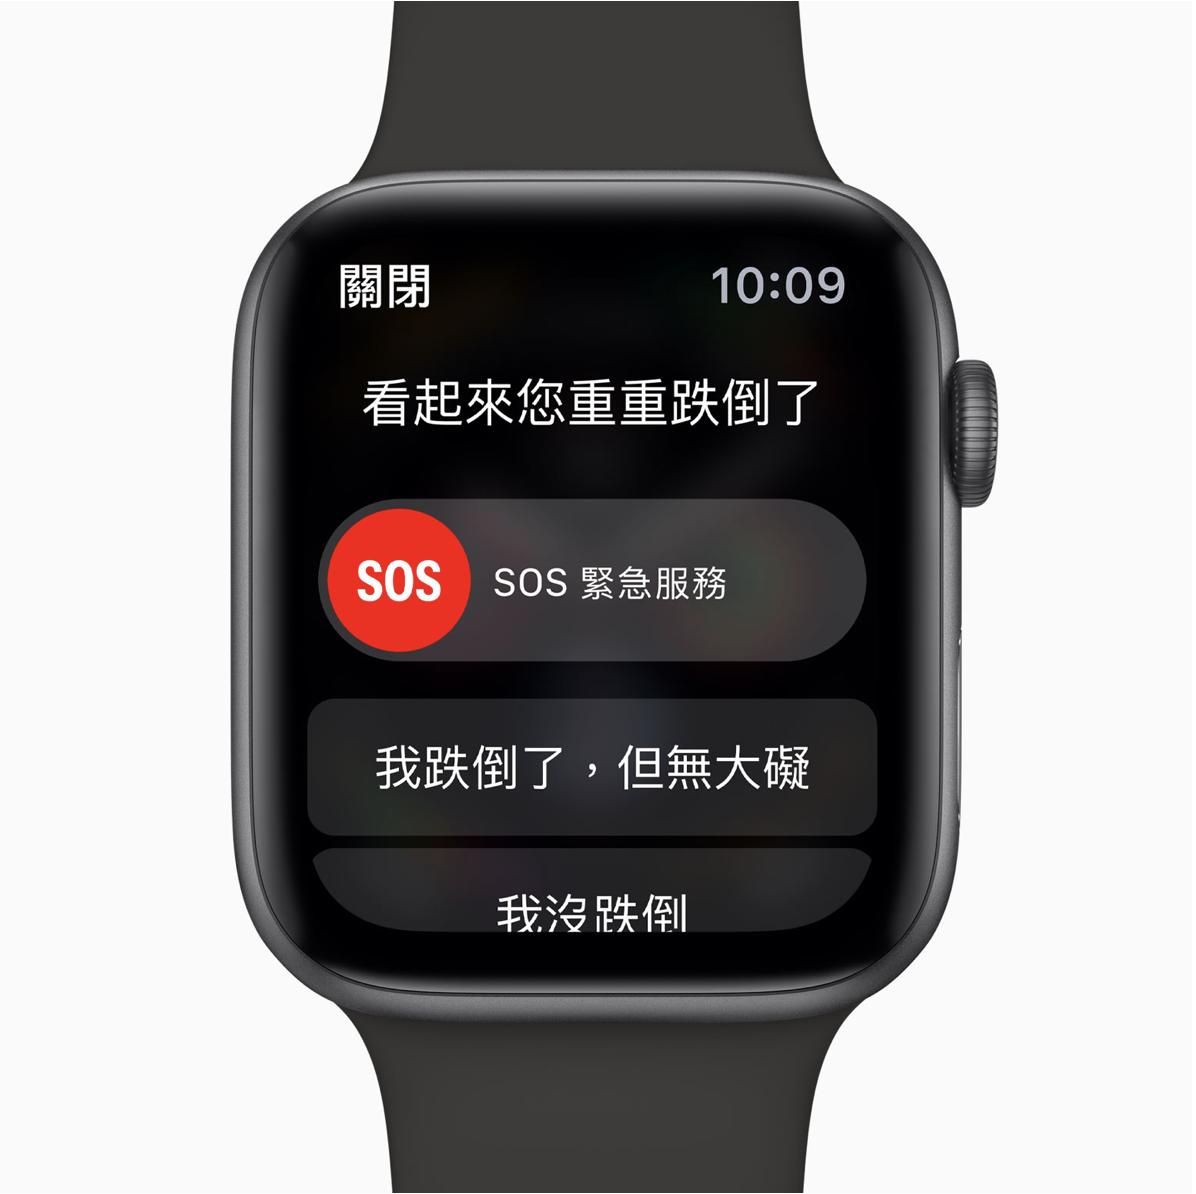 Apple Watch Series 4 使用者 以上 歲 對 功能 65 功能 Apple 跌倒 , Series ...